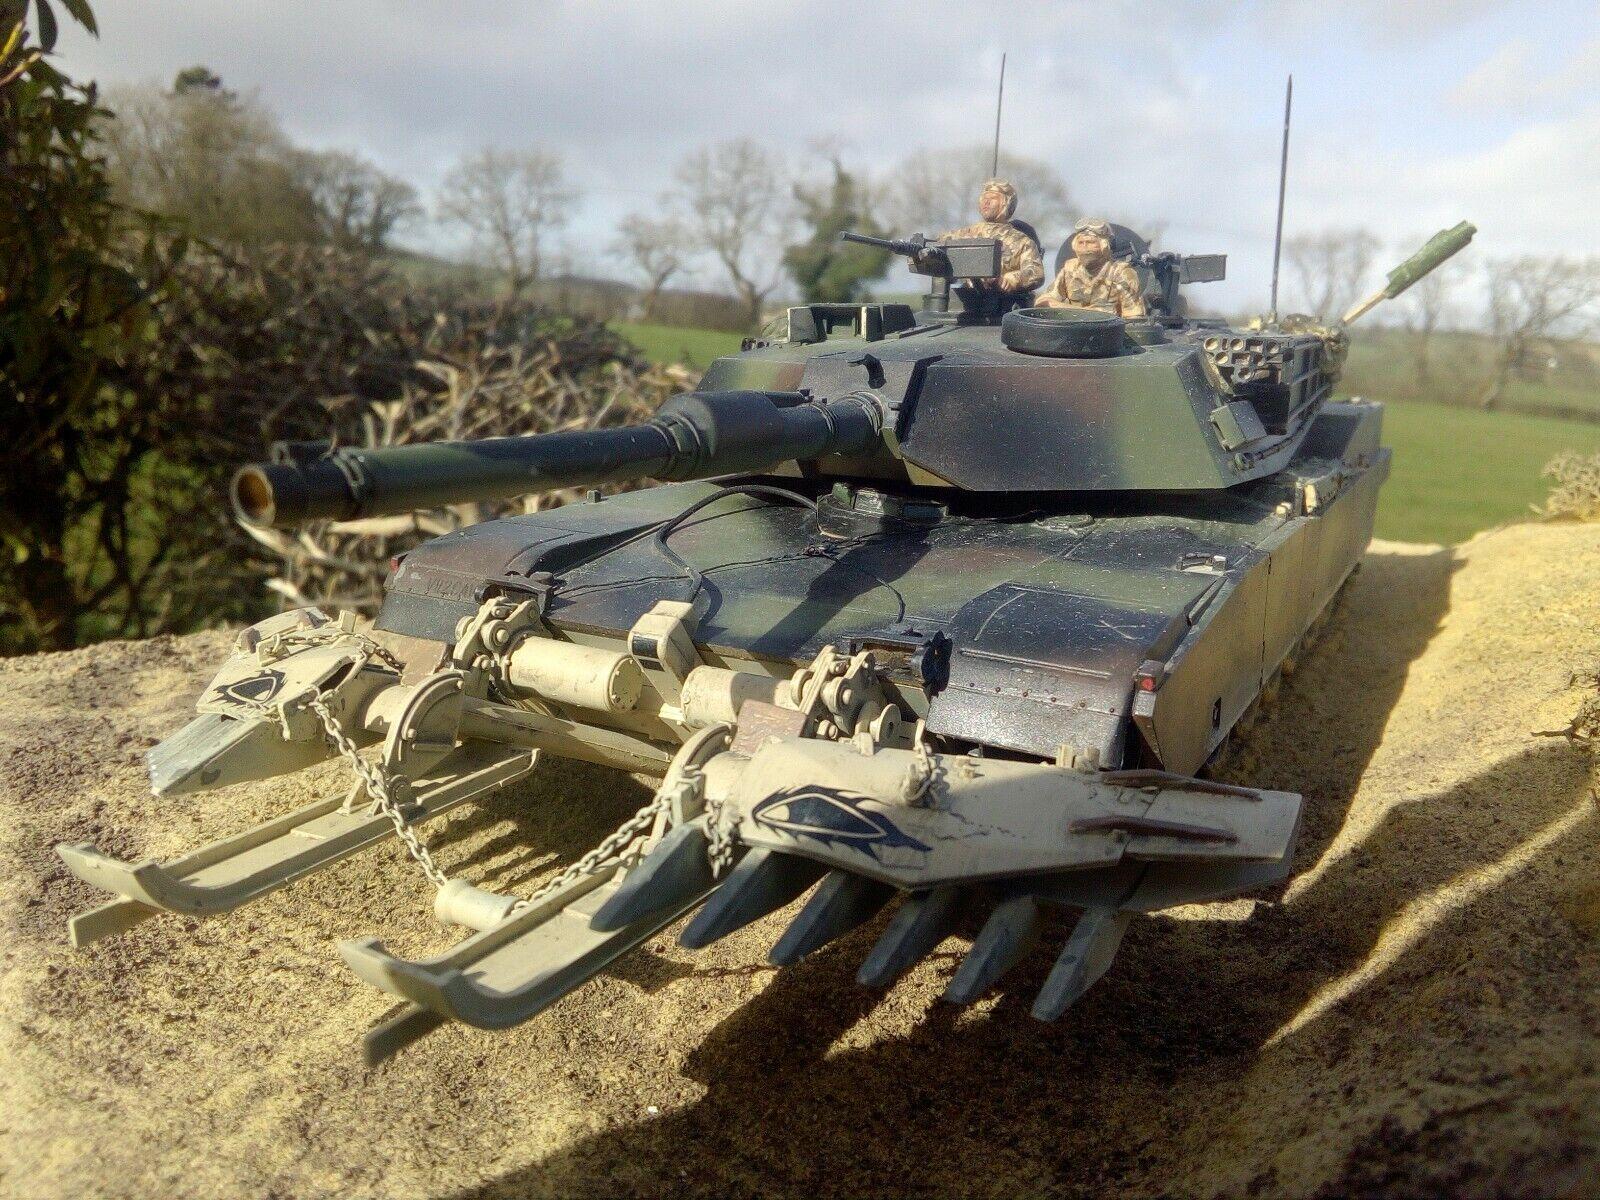 1 35 scale Tamiya U S M1A1 Abrams with Mine Plow  with Diorama Base (JH)